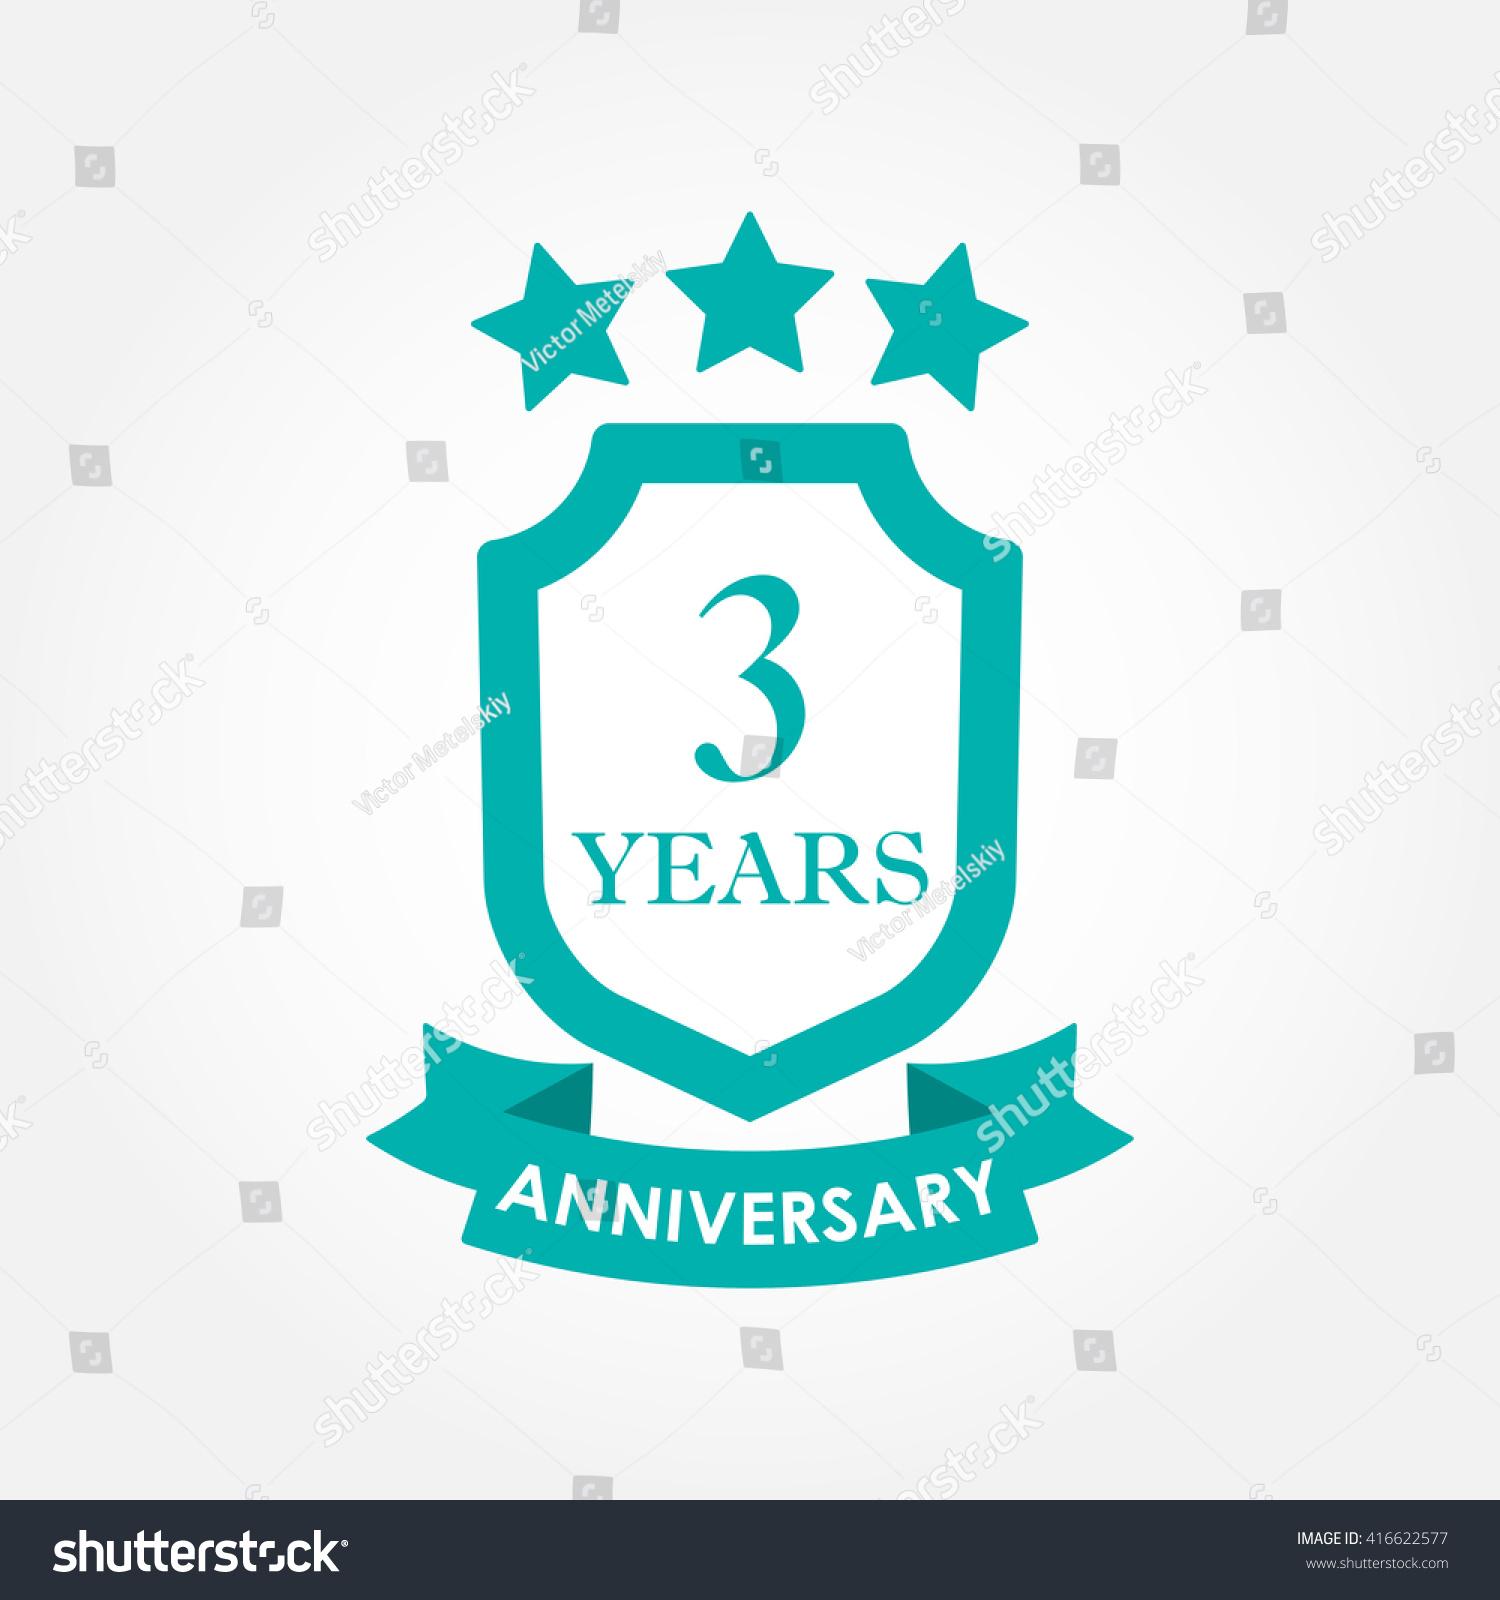 3 years anniversary icon or emblem 3rd anniversary label Celebration invitation and congratulation design element